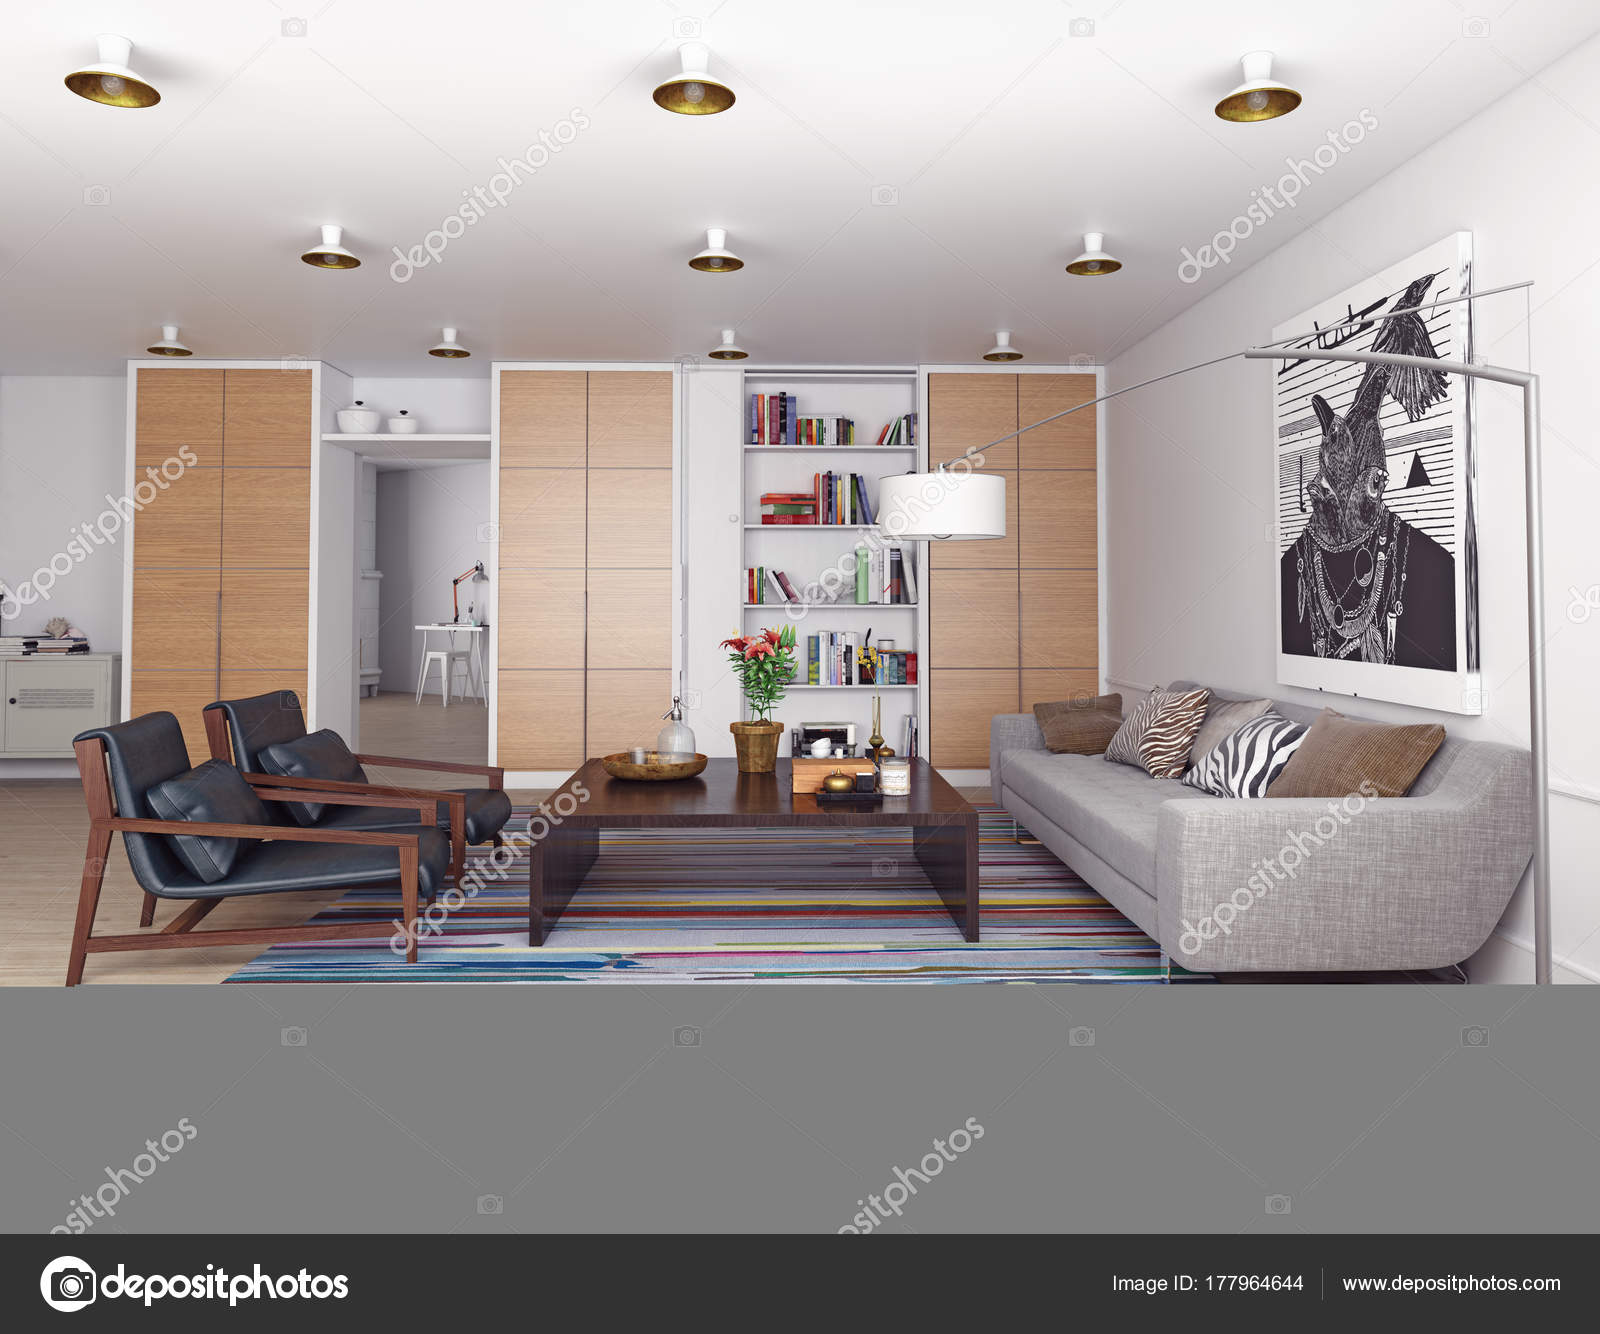 https://st3.depositphotos.com/1009647/17796/i/1600/depositphotos_177964644-stockafbeelding-moderne-woonkamer-ontwerp-rendering-interieurconcept.jpg